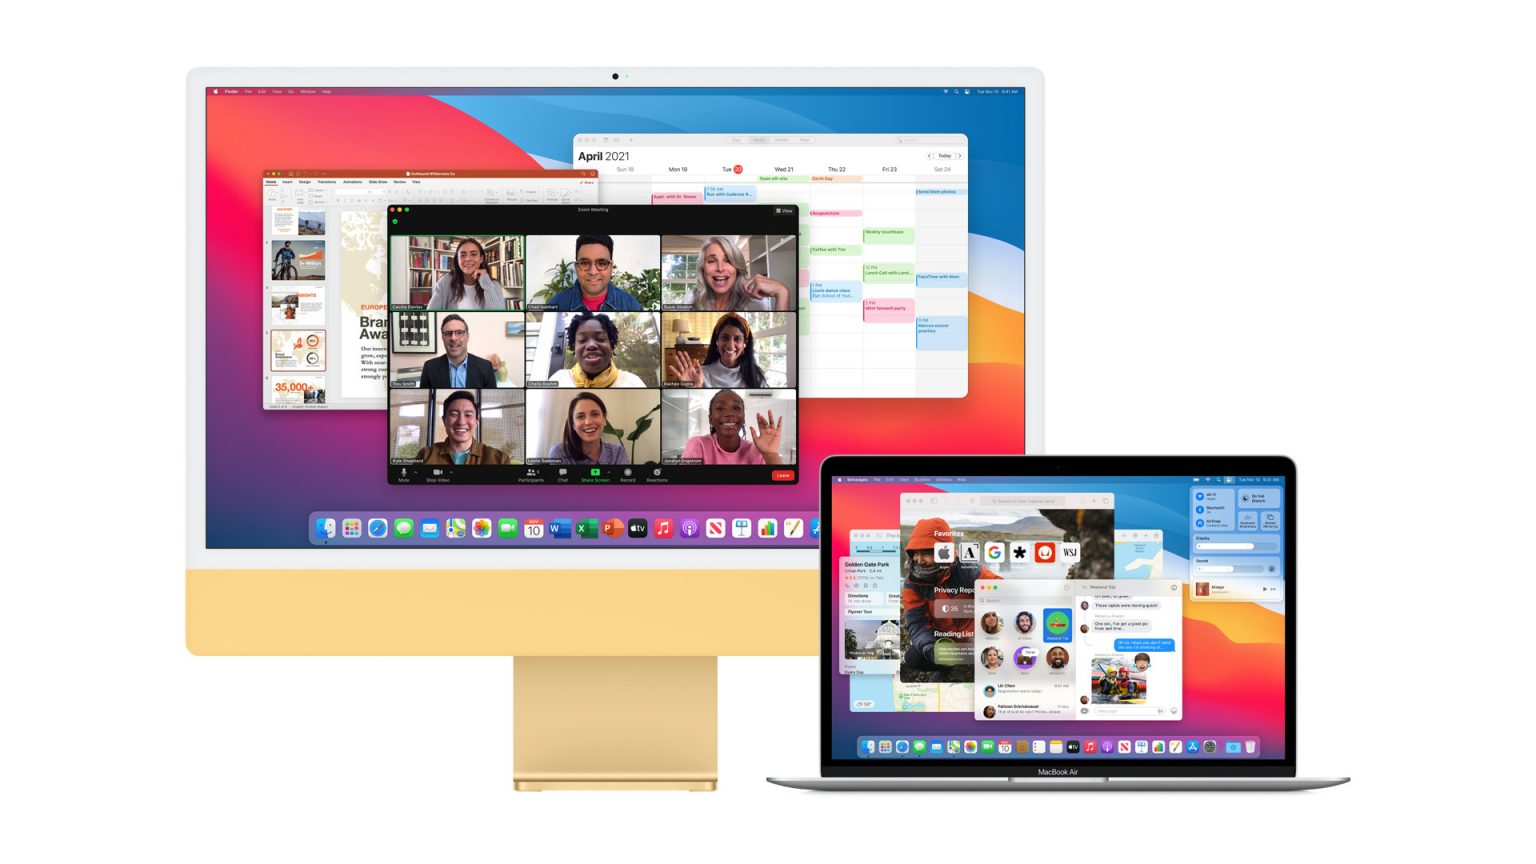 macOS Monterey turns a second Mac into an external display